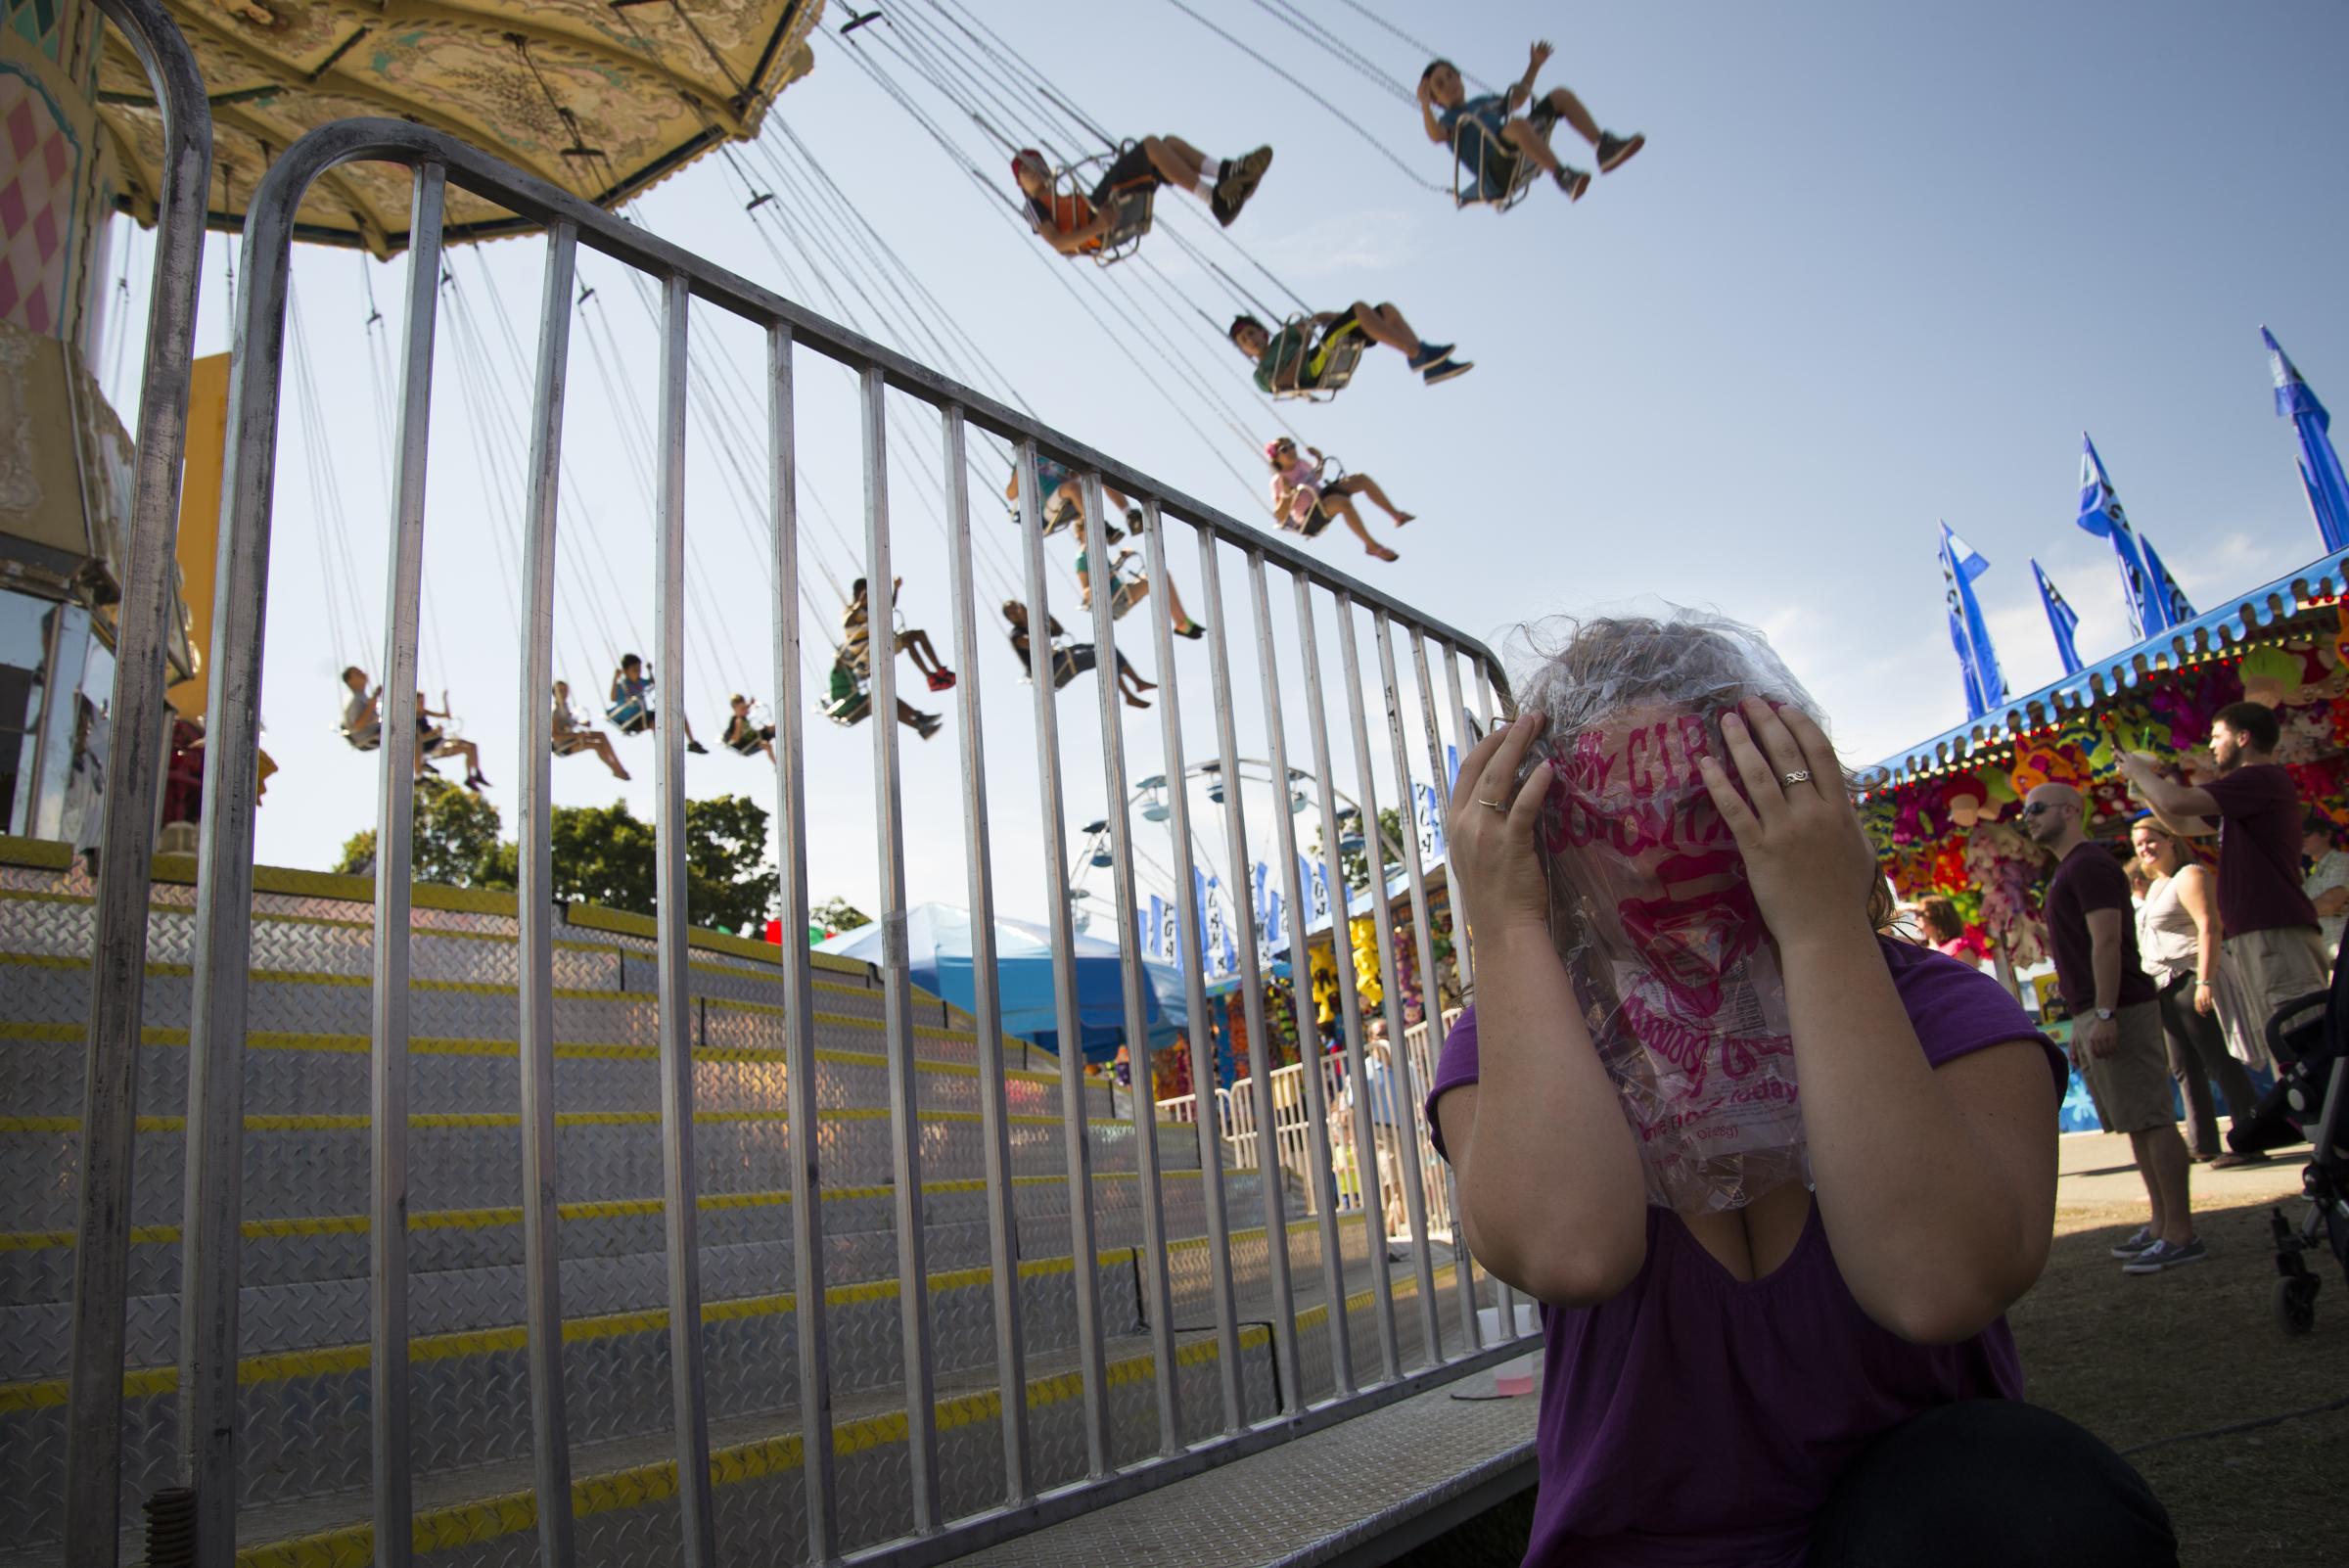 08252013-CarnivalScene-JuliaLuckettPhotography-8